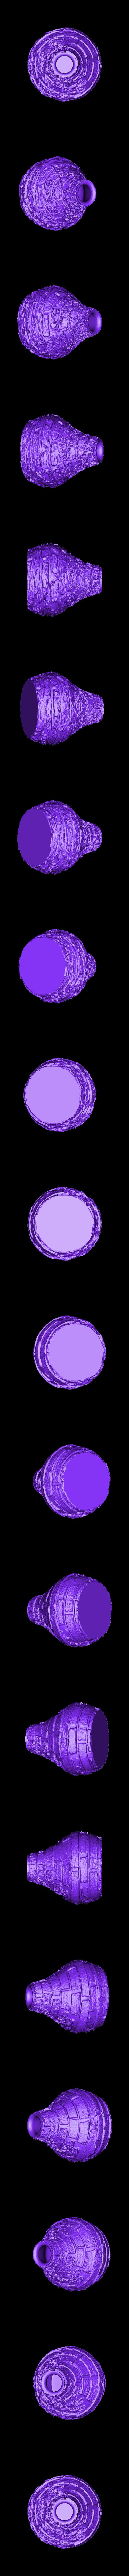 vase break wall.stl Télécharger fichier STL X86 Mini vase collection  • Objet imprimable en 3D, motek